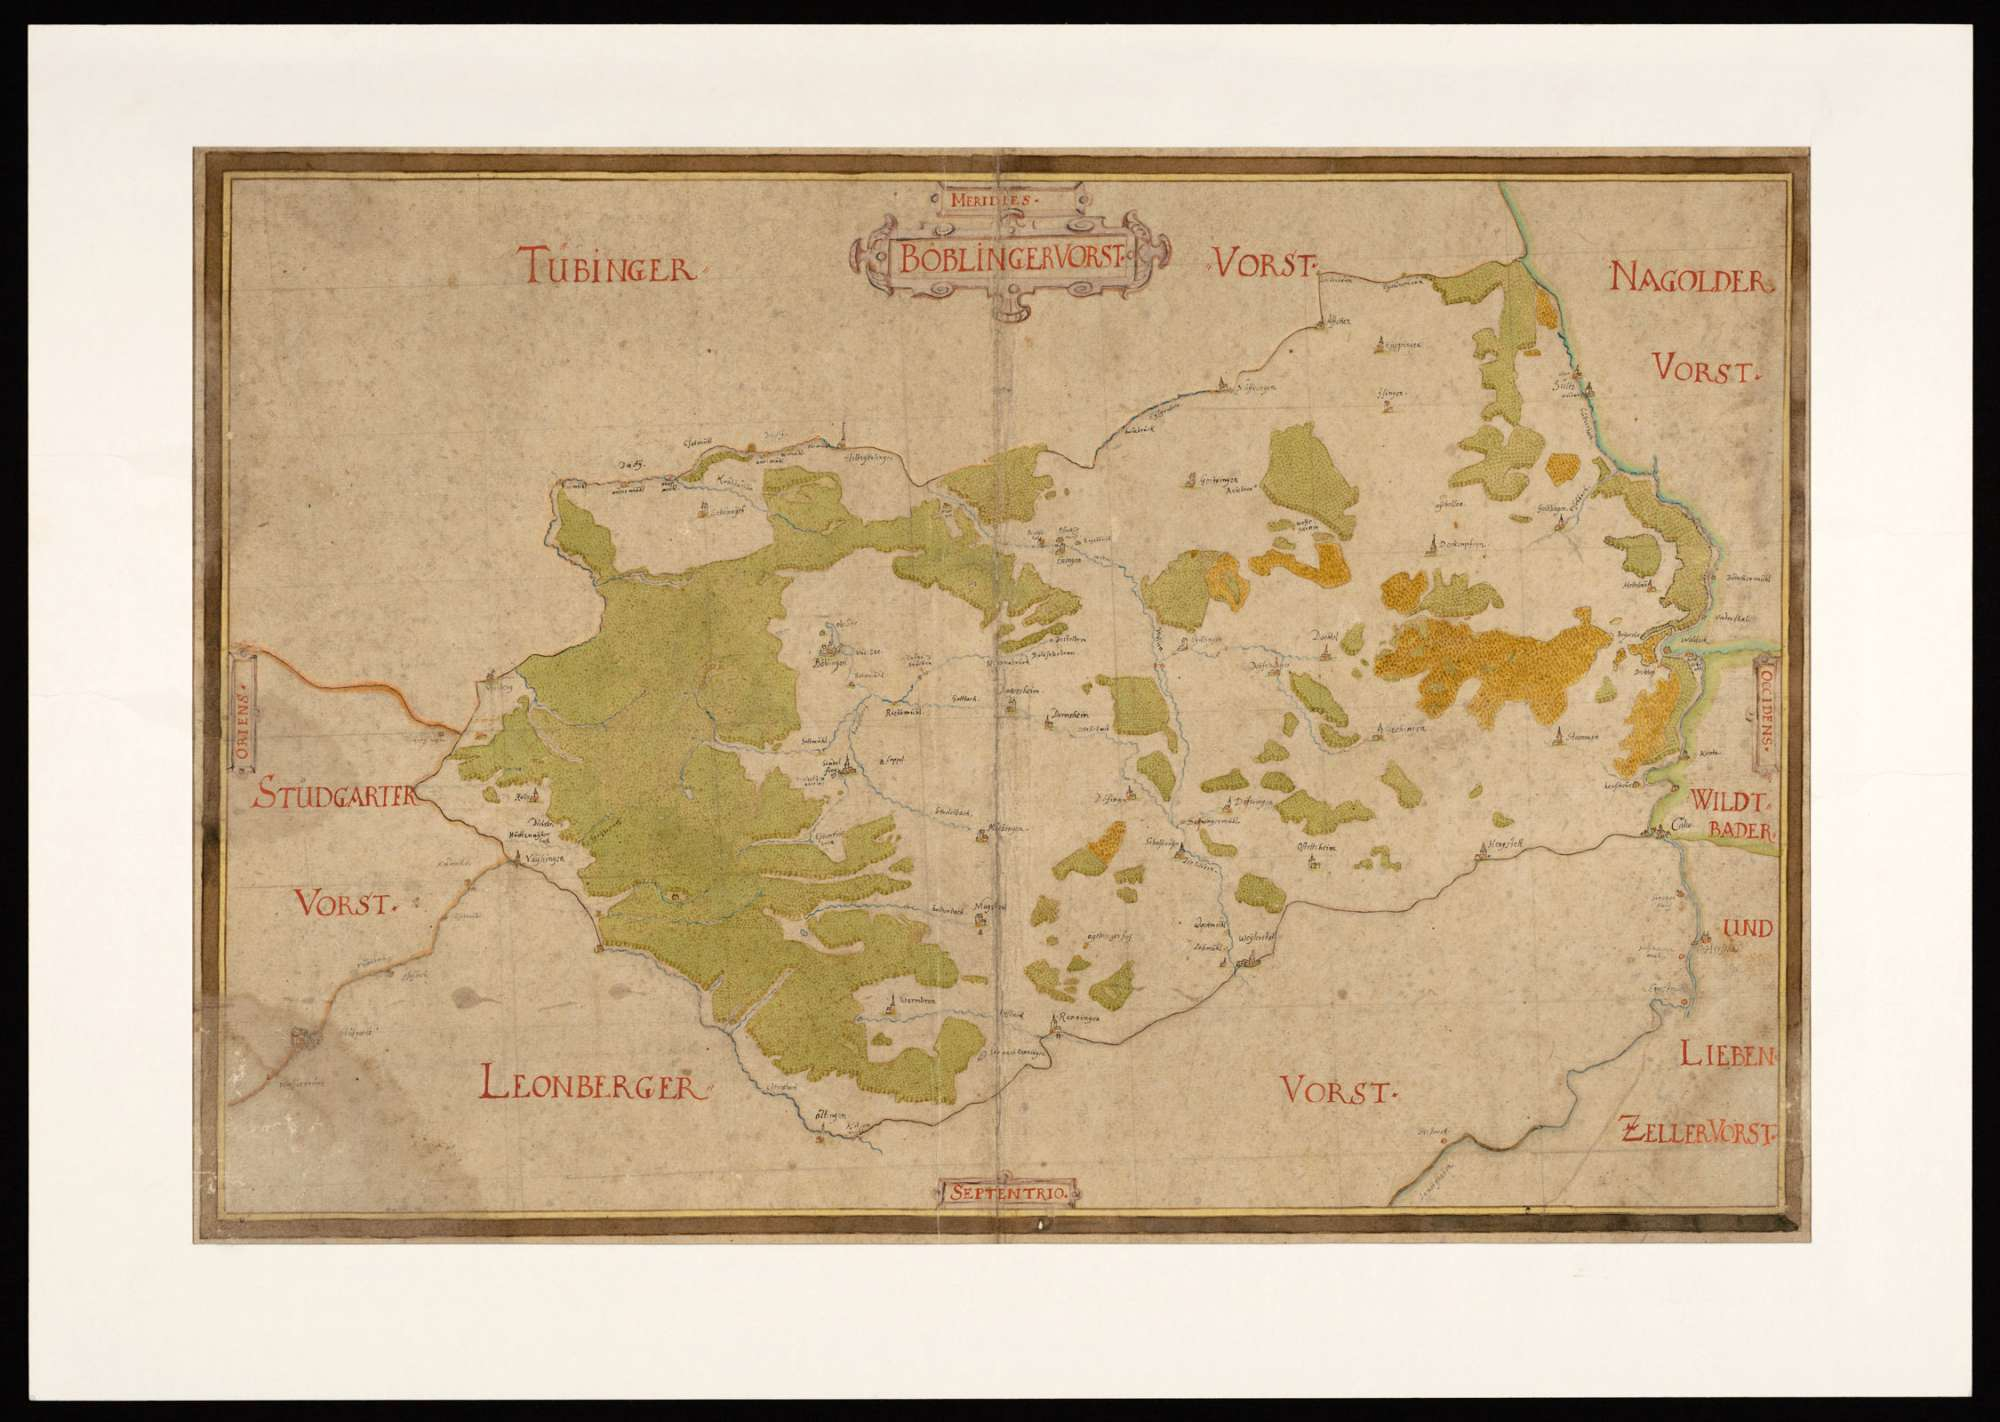 [Karte des Böblinger Forstes], Bild 1